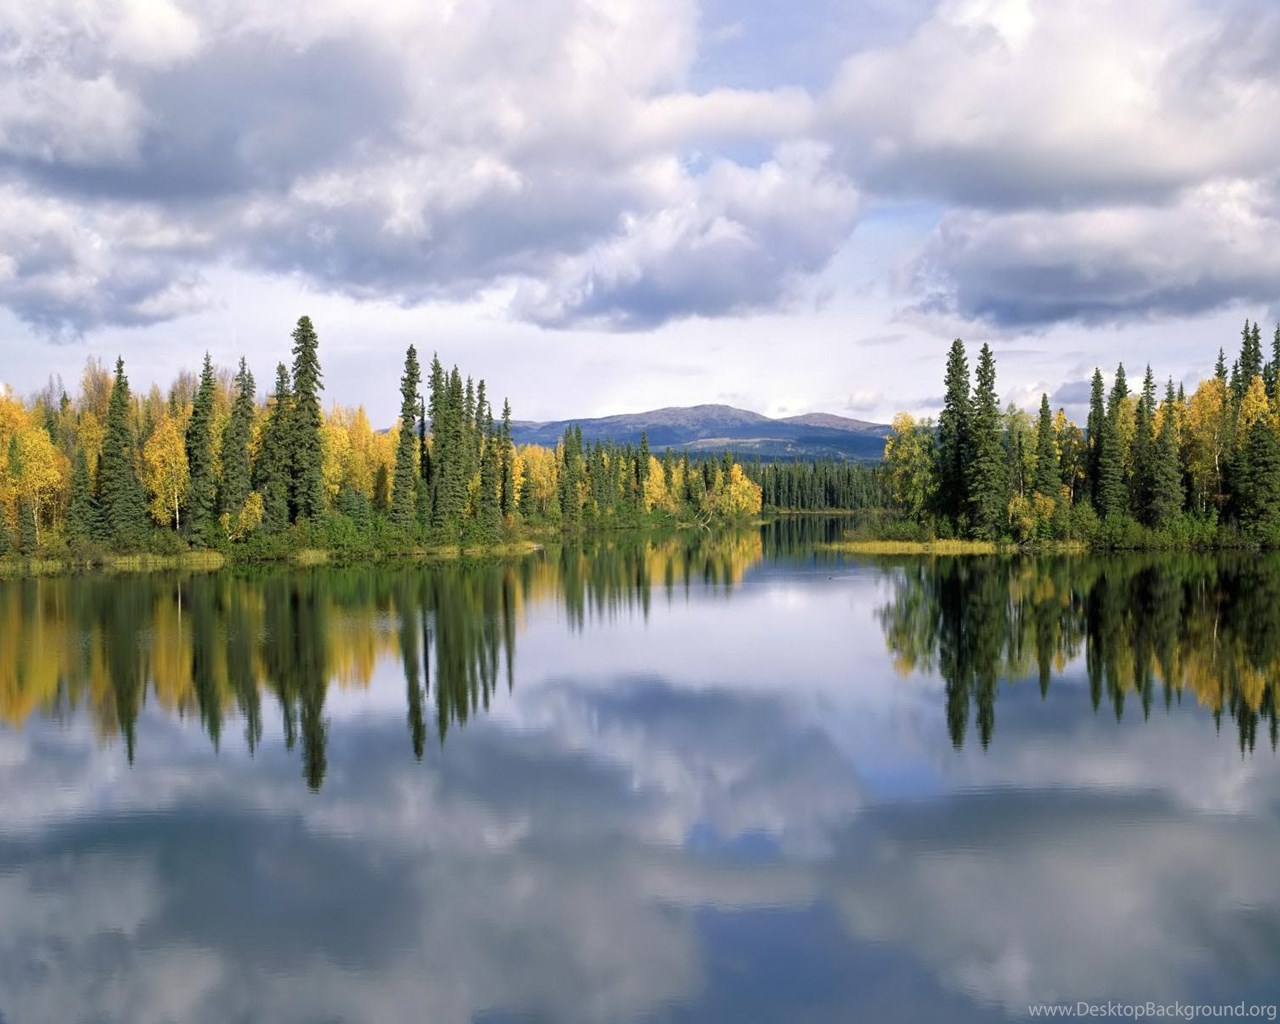 Desktop wallpapers gallery nature great lake plains - Nature wallpaper collection zip ...